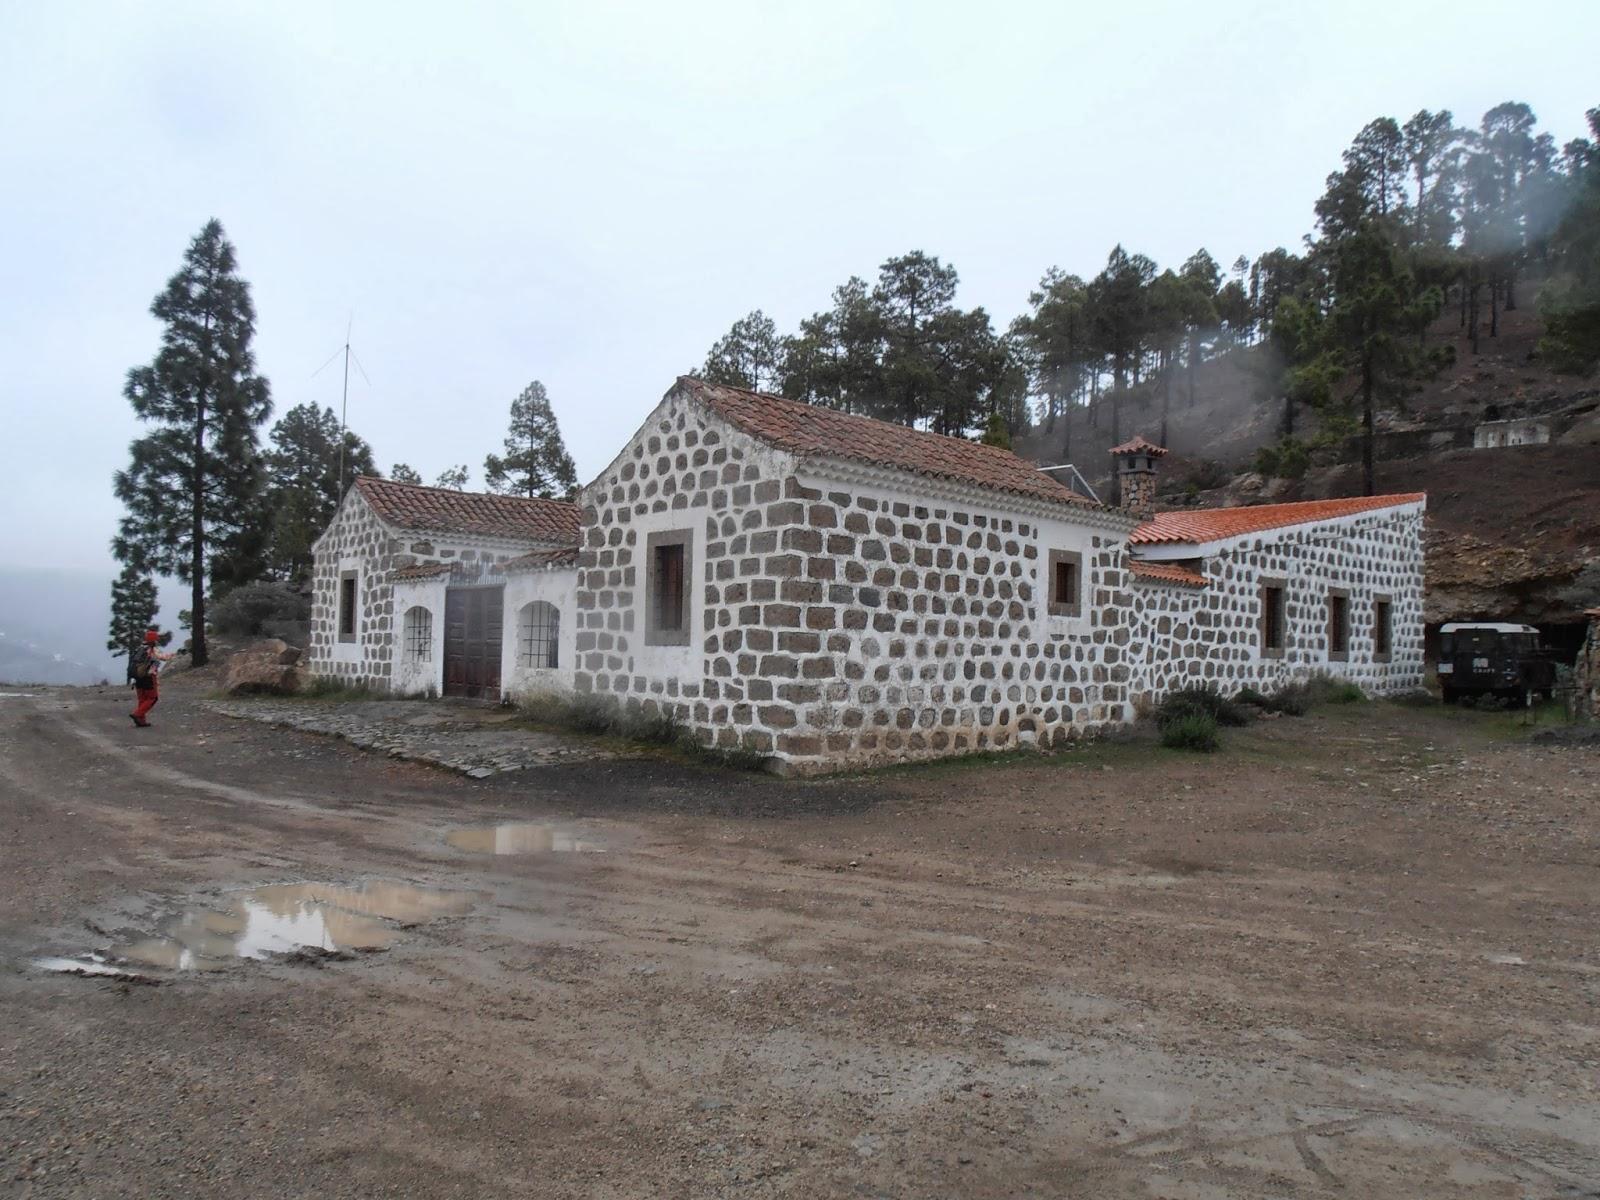 Casa forestal de Pajonales